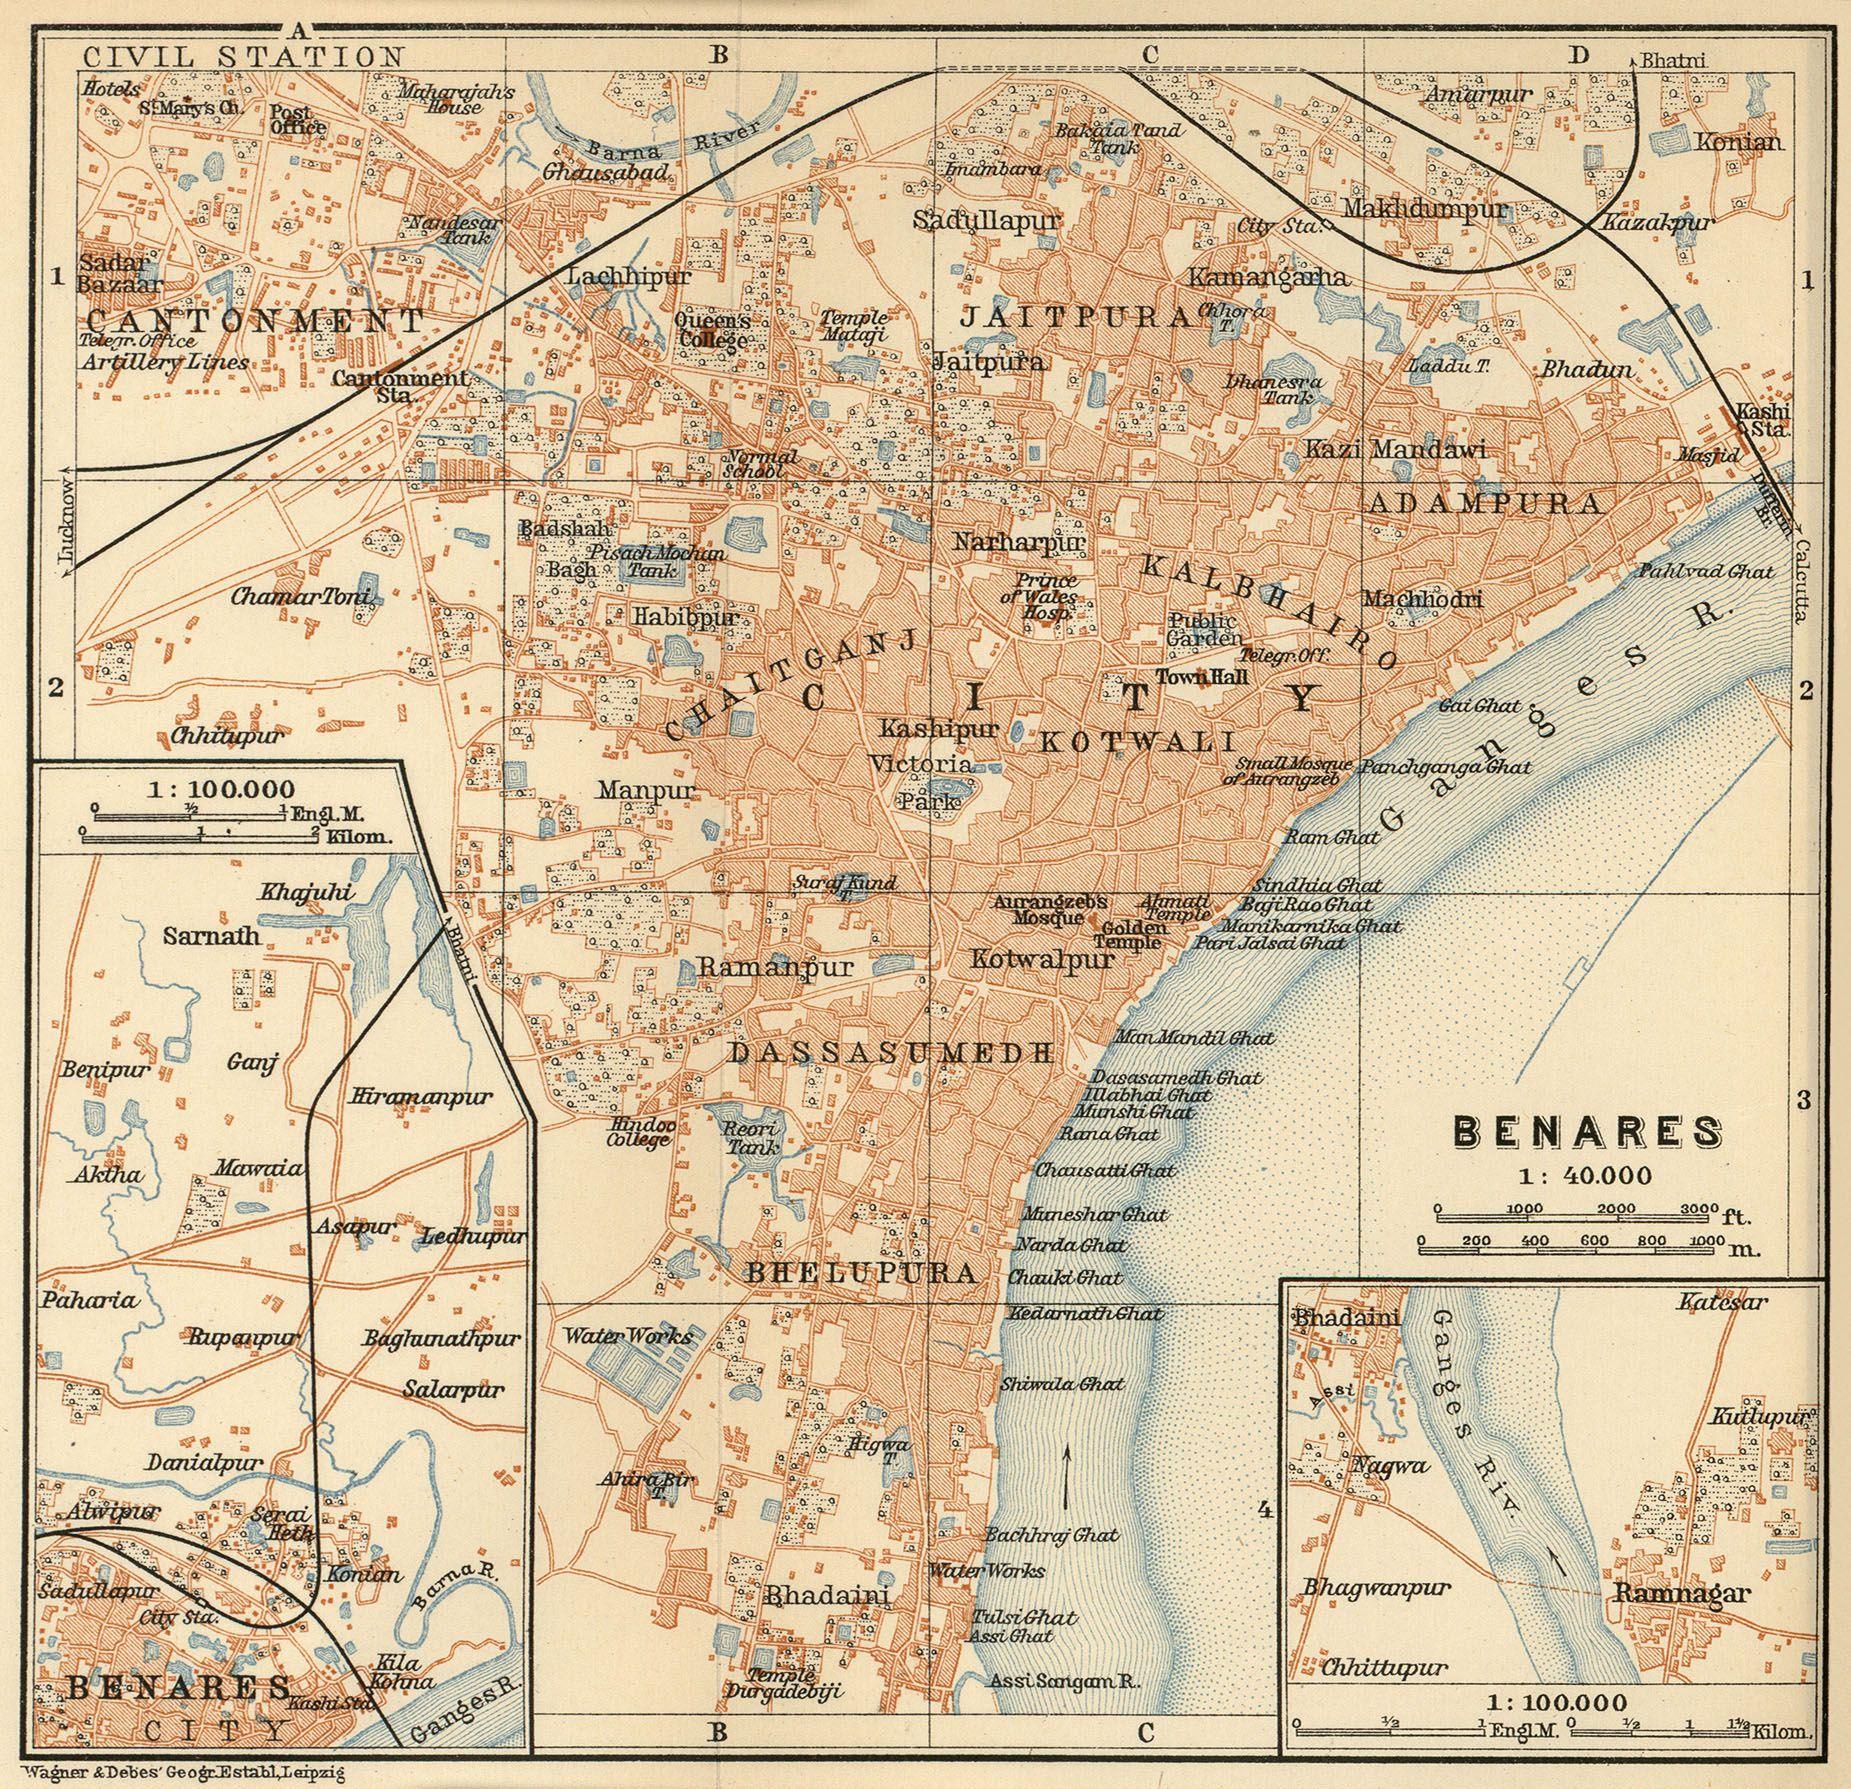 Map Of Varanasi Varanasi Images Pinterest Varanasi - Varanasi map